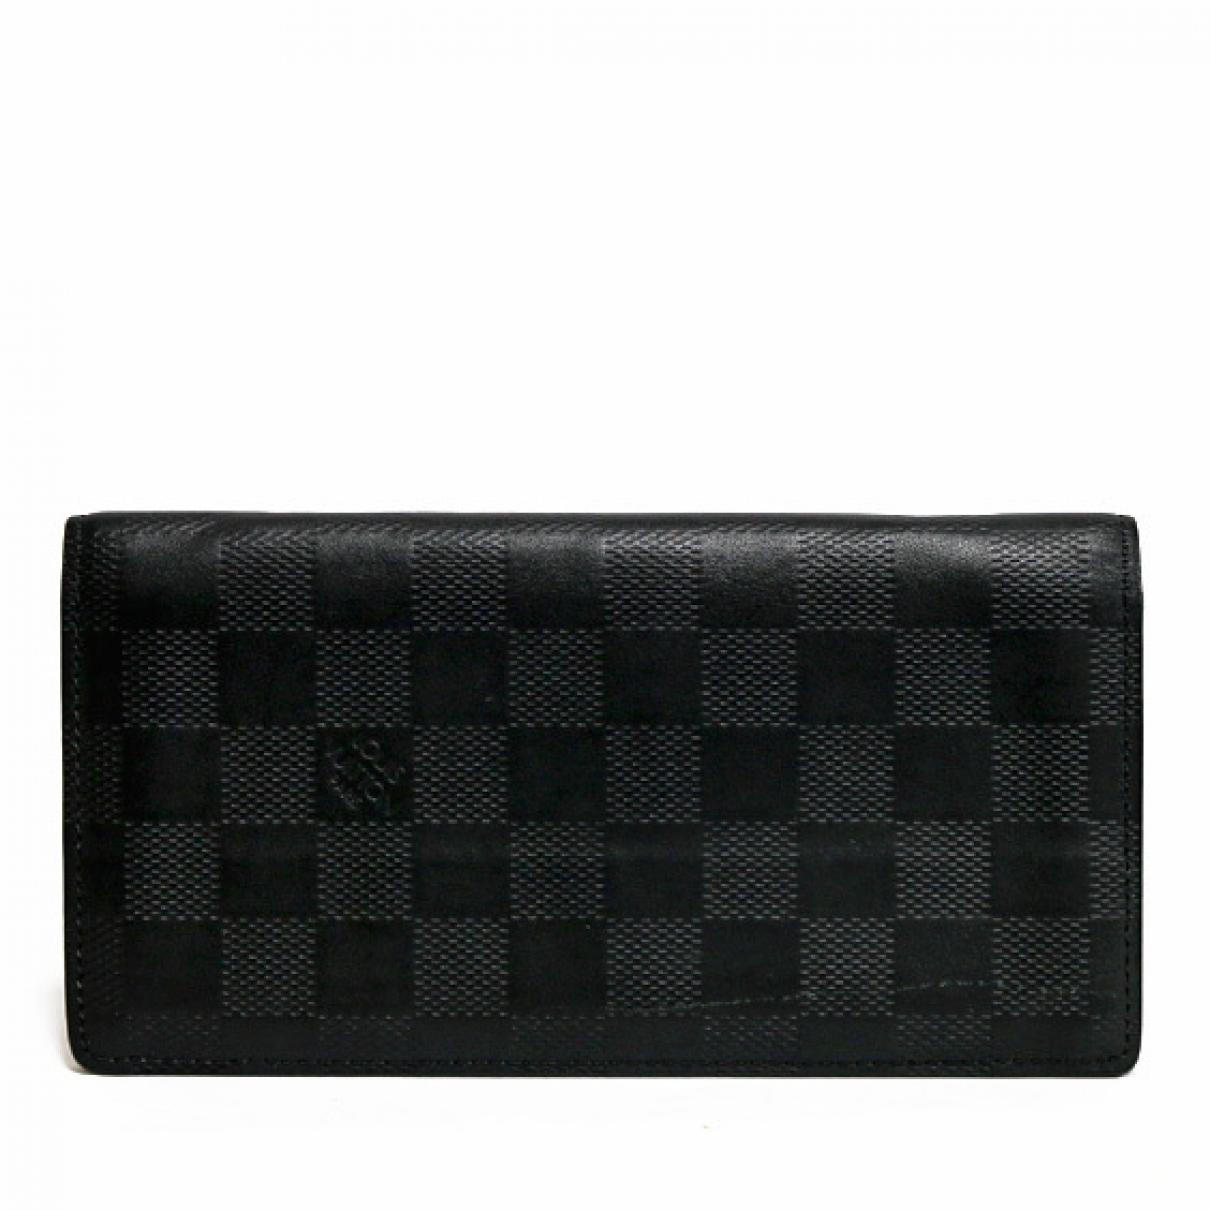 Marroquineria Brazza de Cuero Louis Vuitton